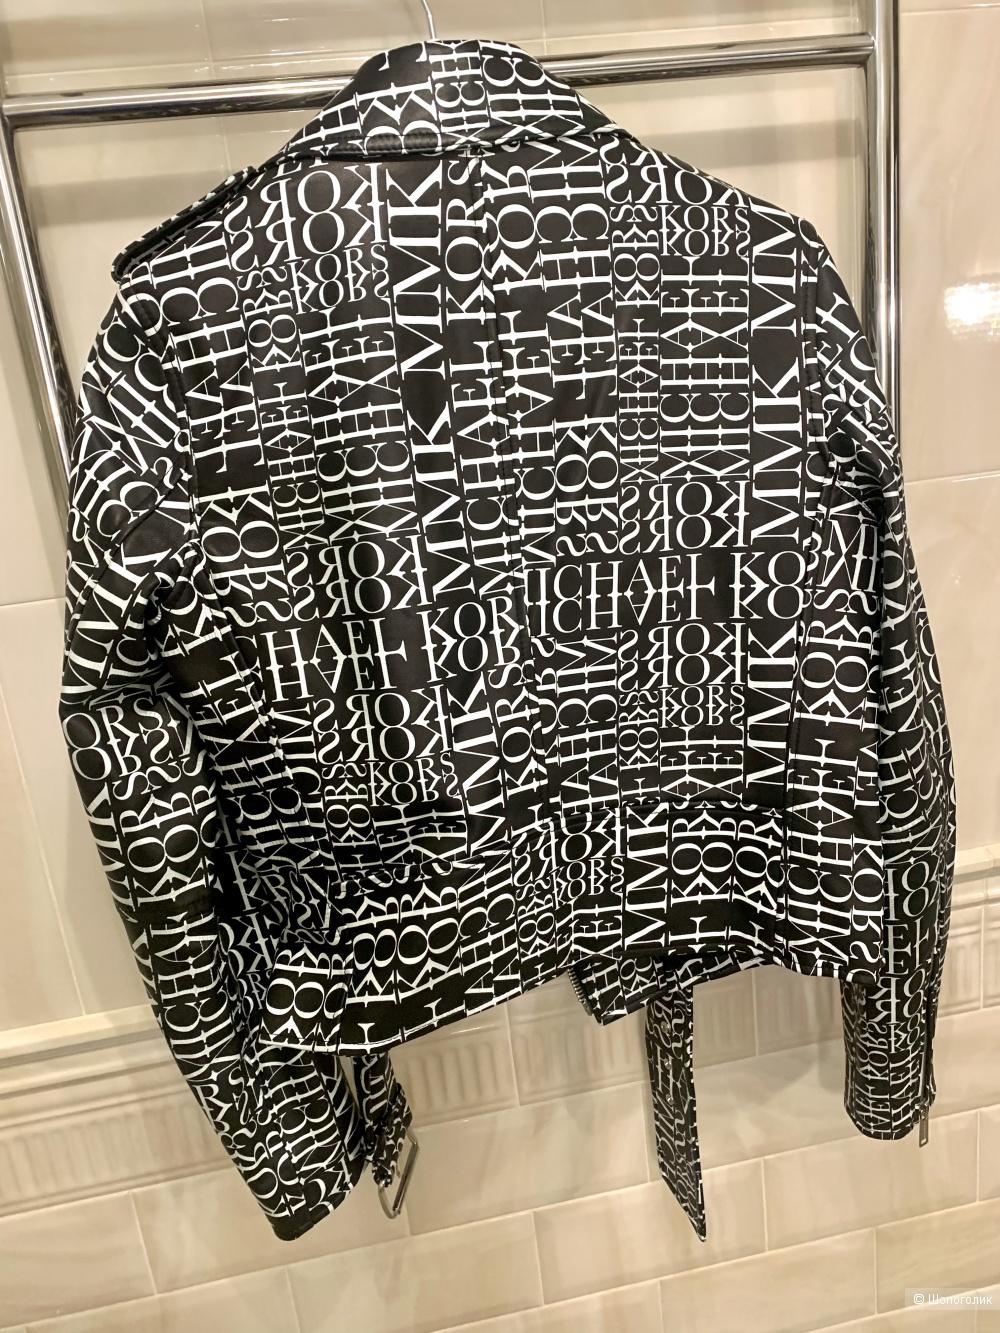 Куртка  от Michael Kors, размер S